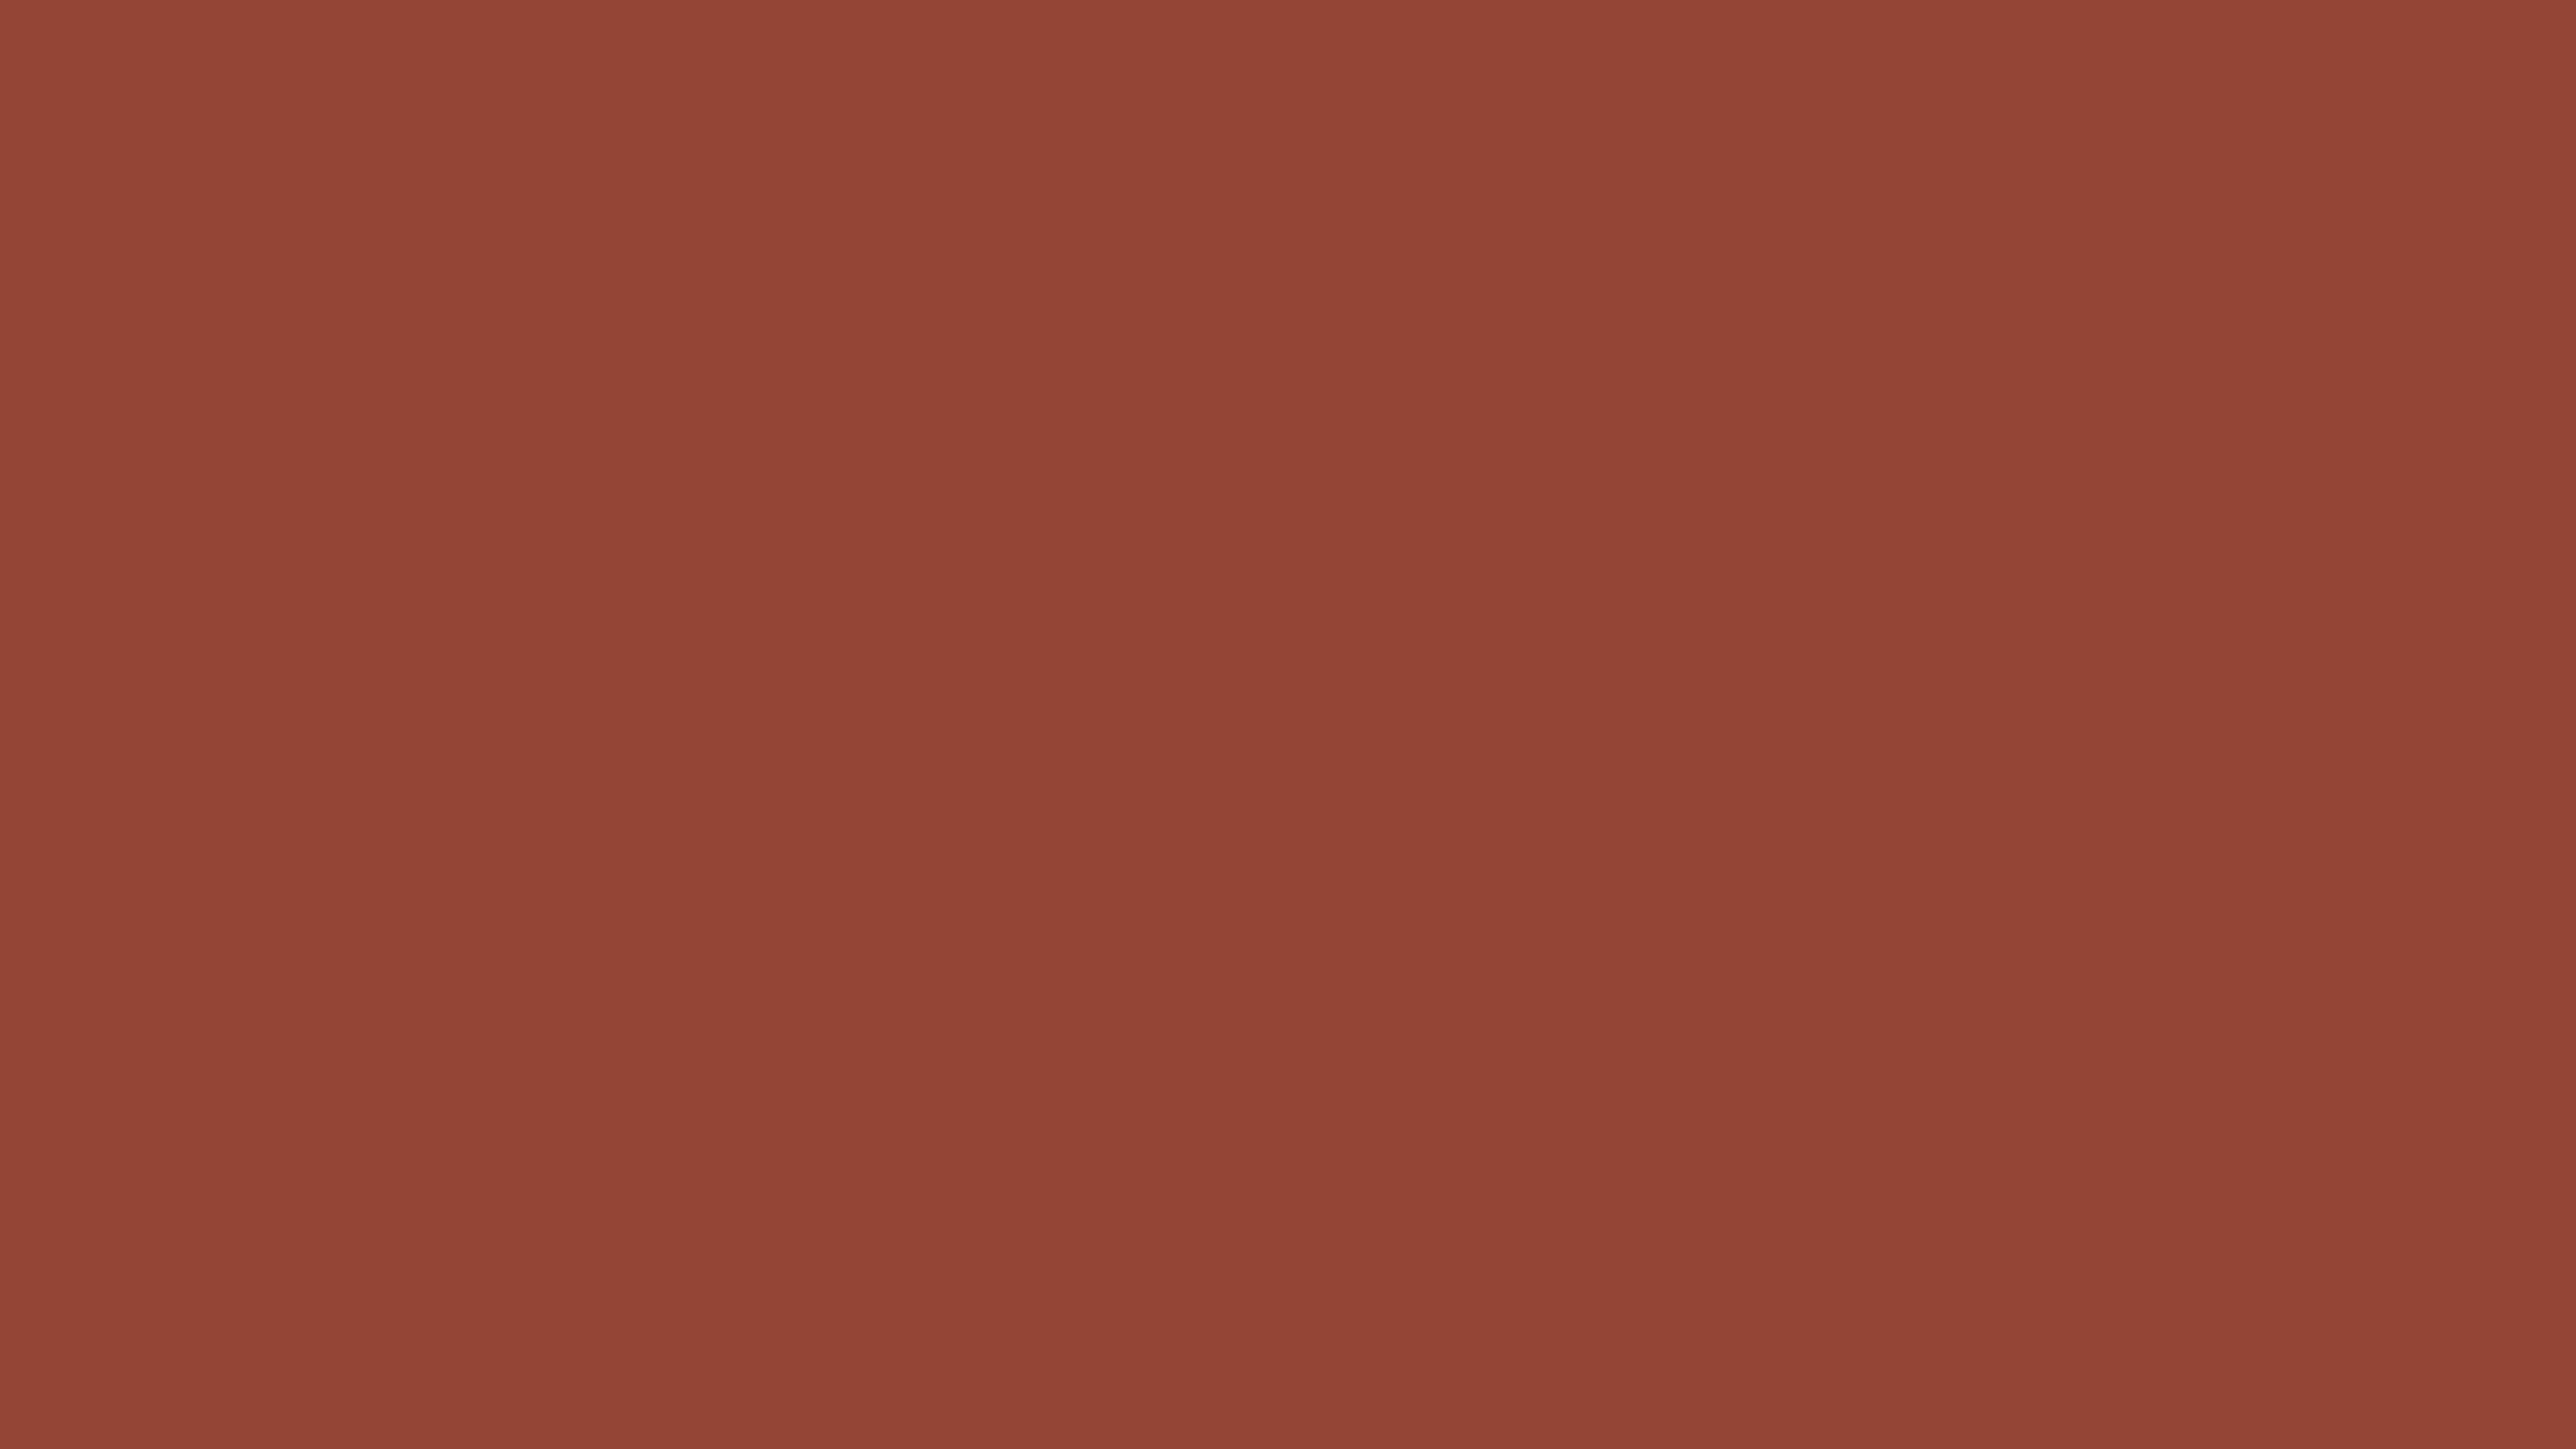 5120x2880 Chestnut Solid Color Background